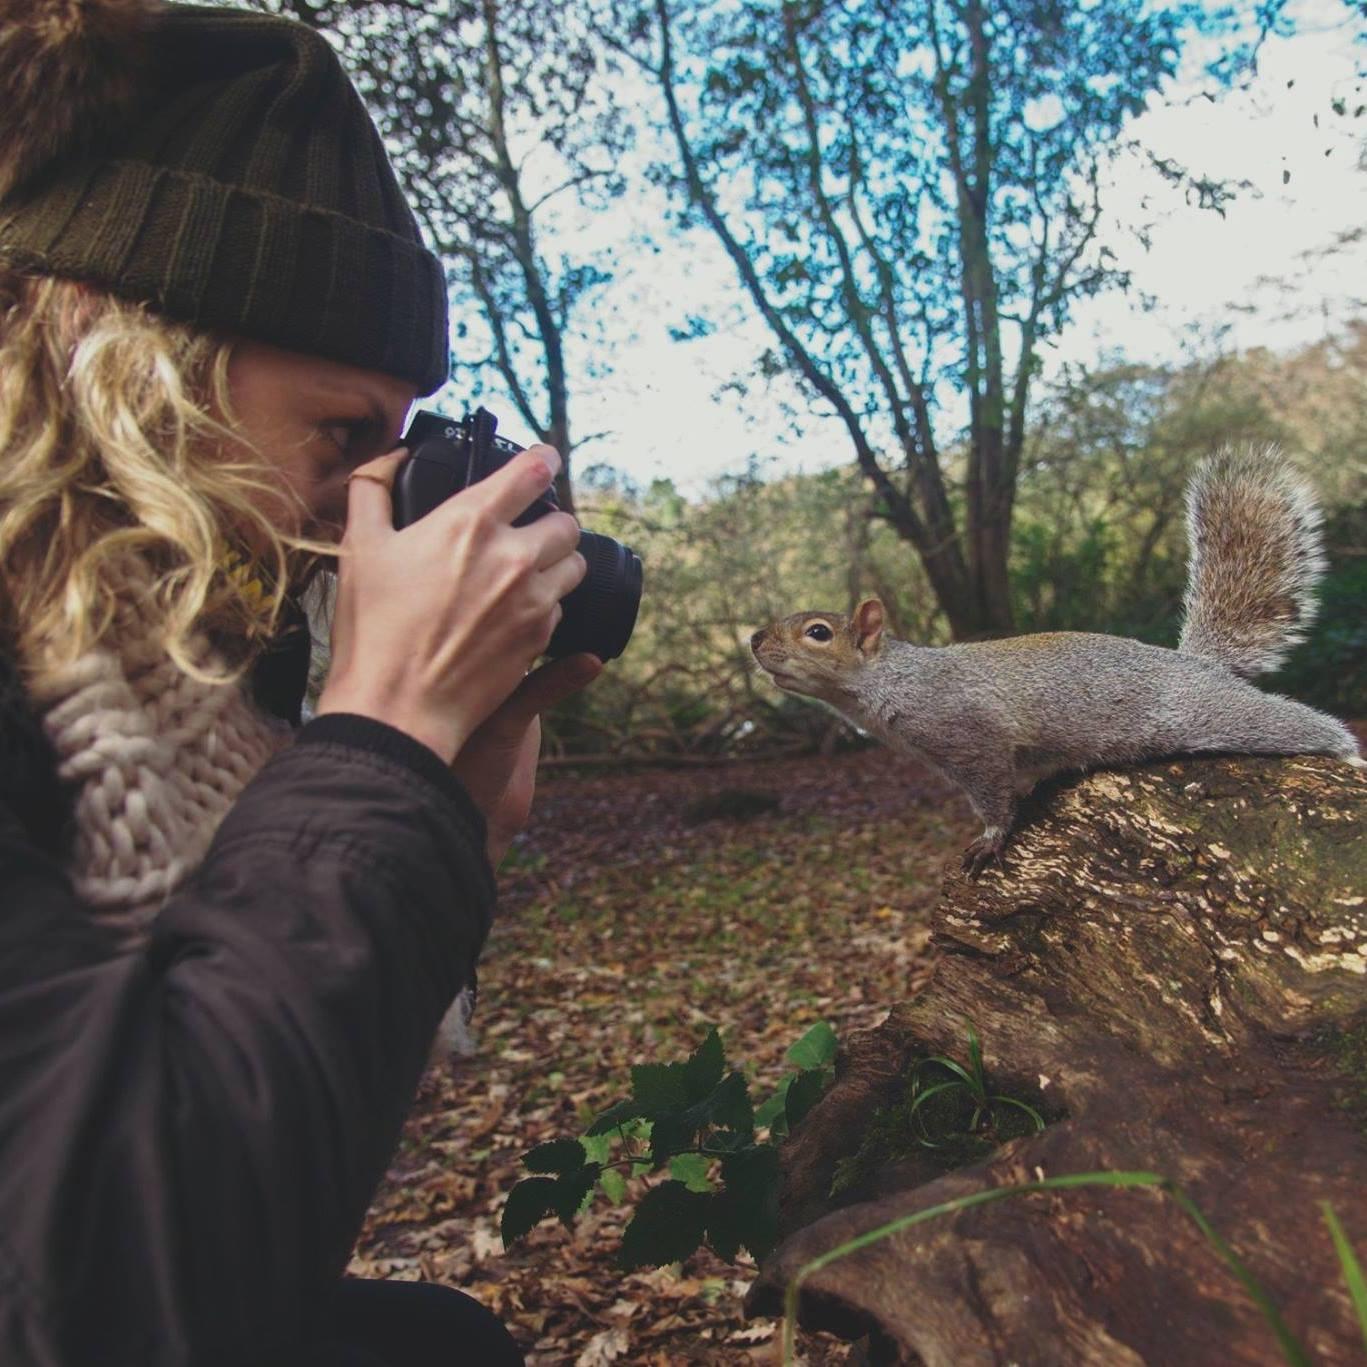 Elizabeth Streeter - Photographer & Filmmaker